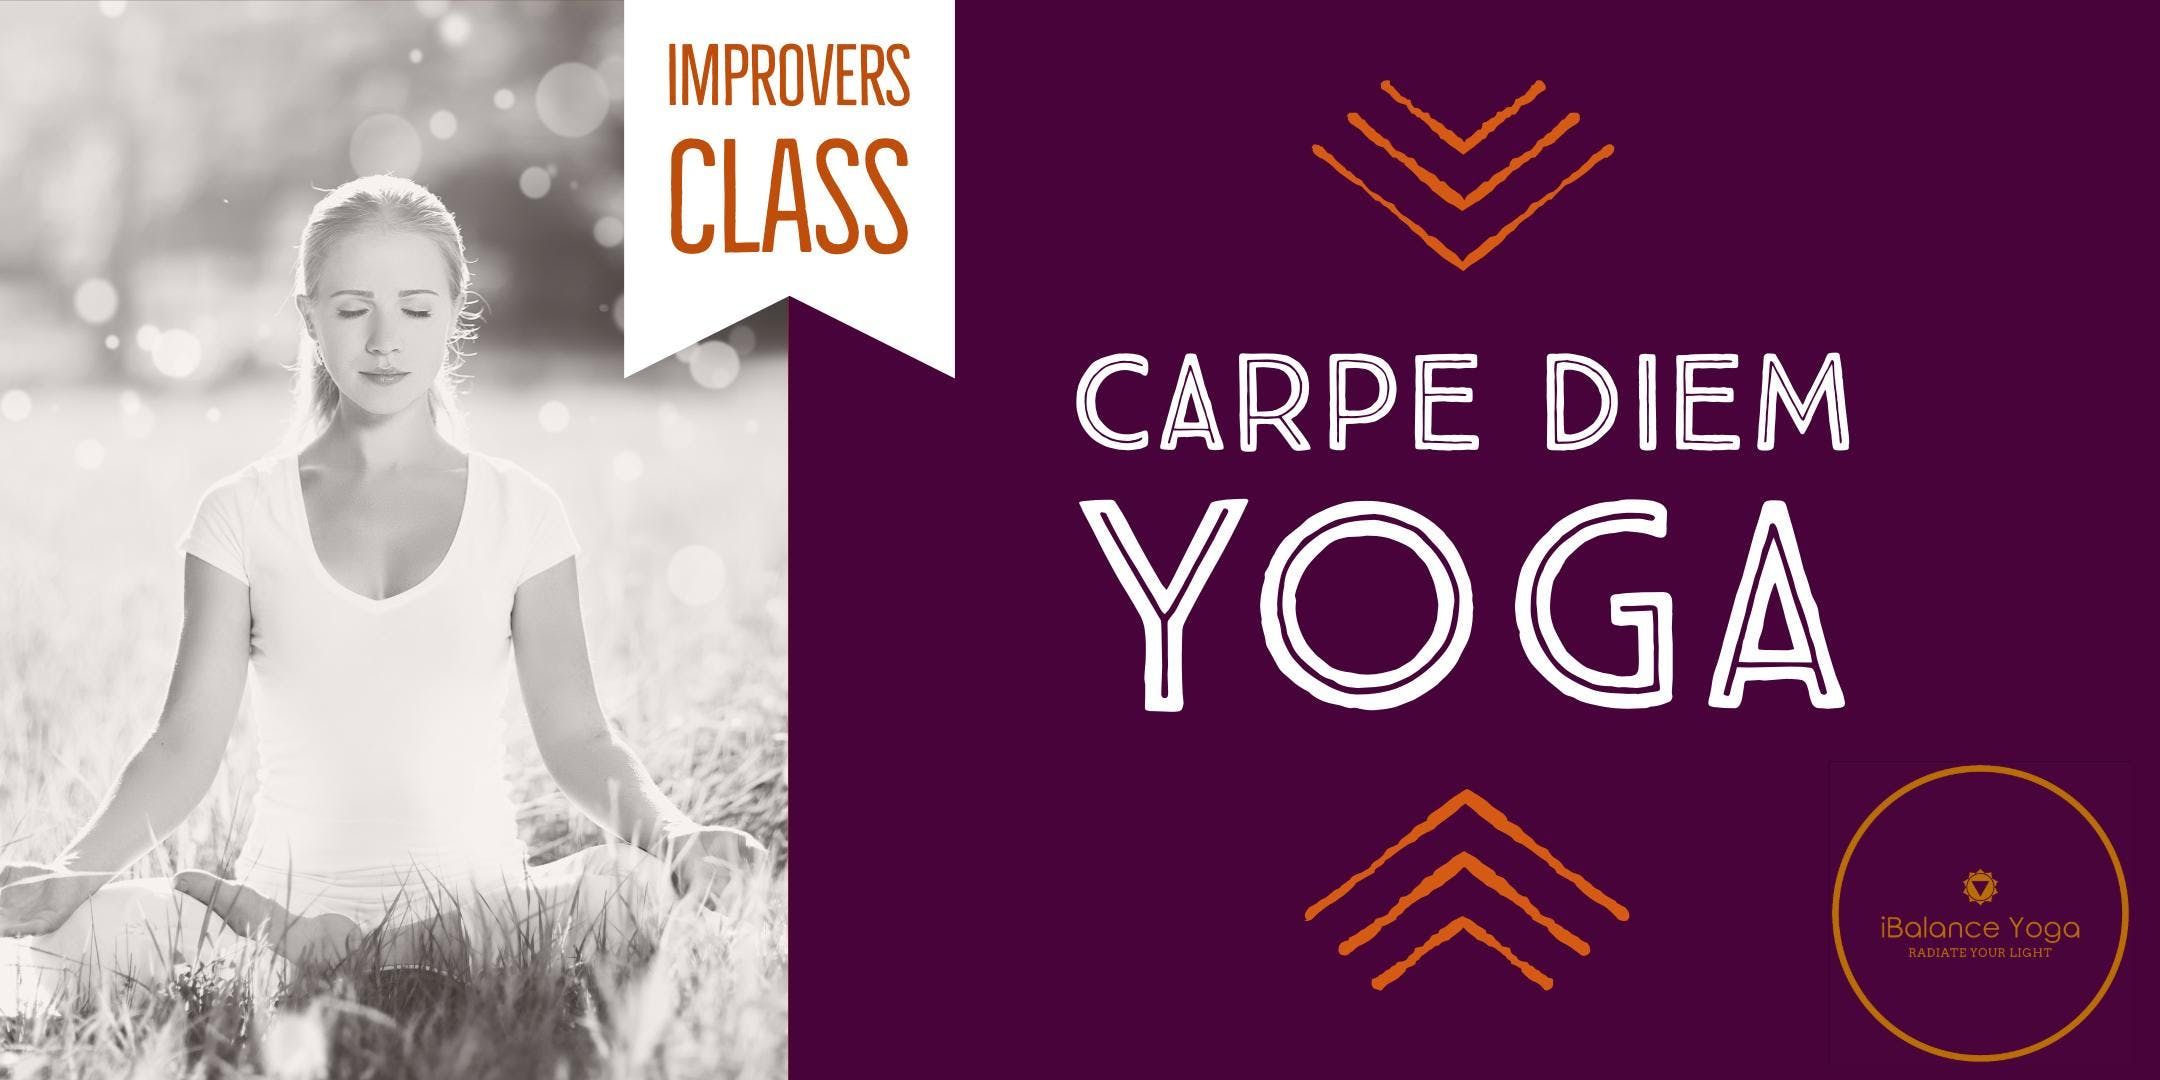 Carpe Diem Yoga for Improvers